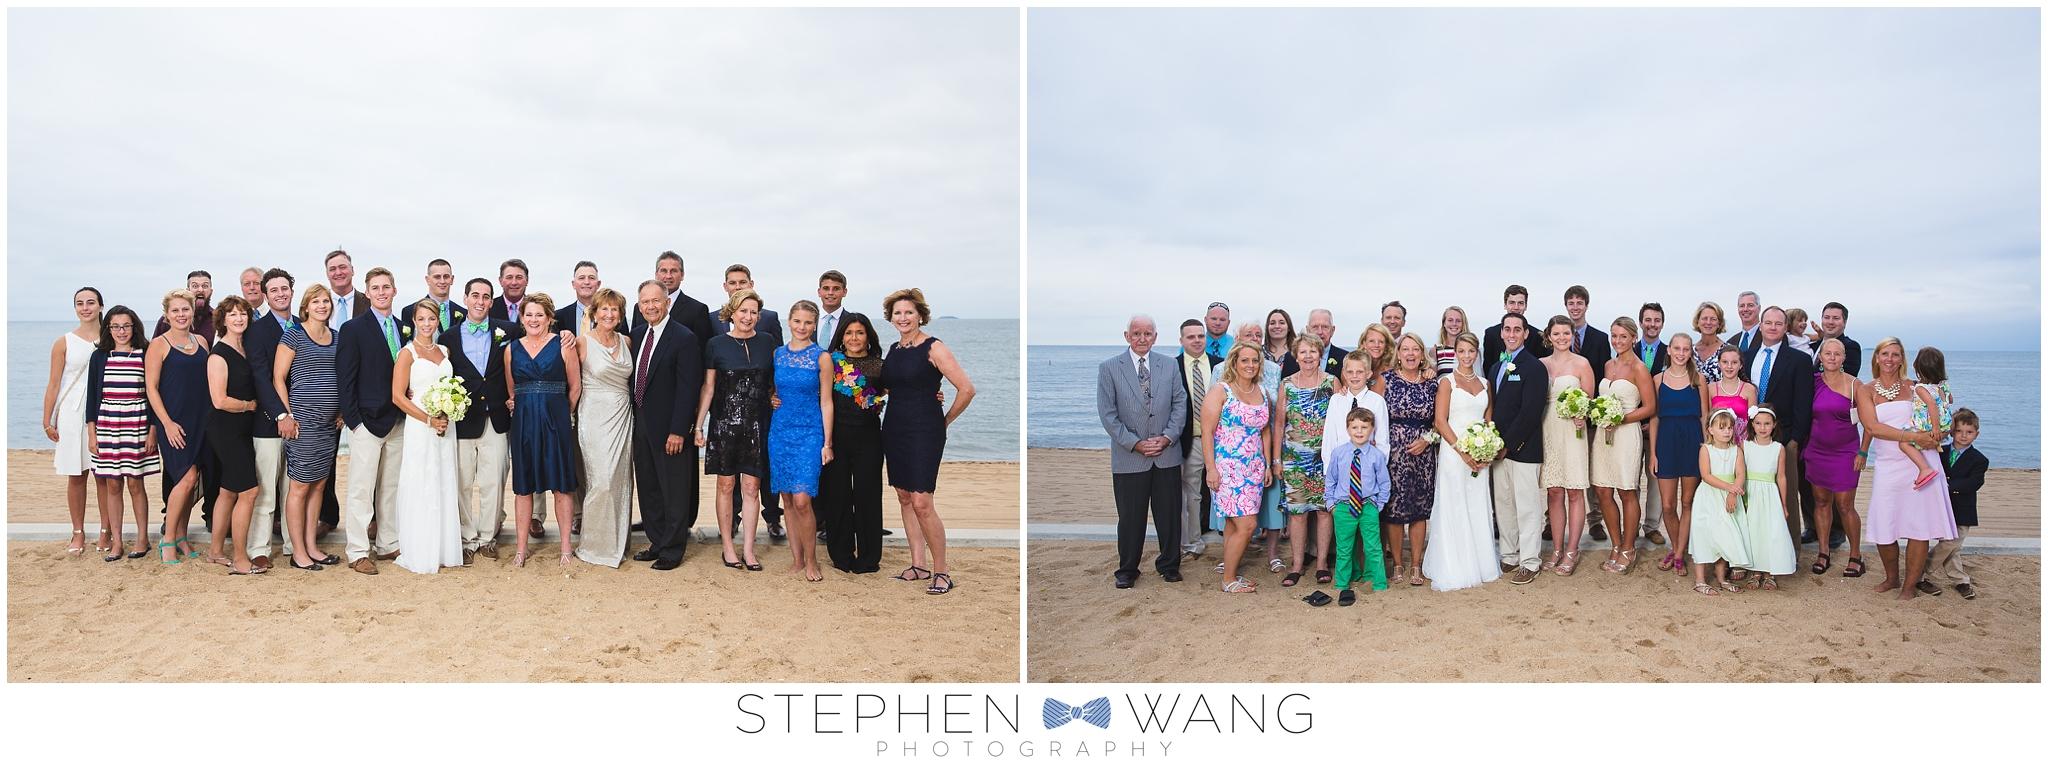 Stephen Wang Photography Madison Surf Club Wedding Photogrpahy CT Connecticut Shoreline Beach Summer Sunset -08-12_0017.jpg